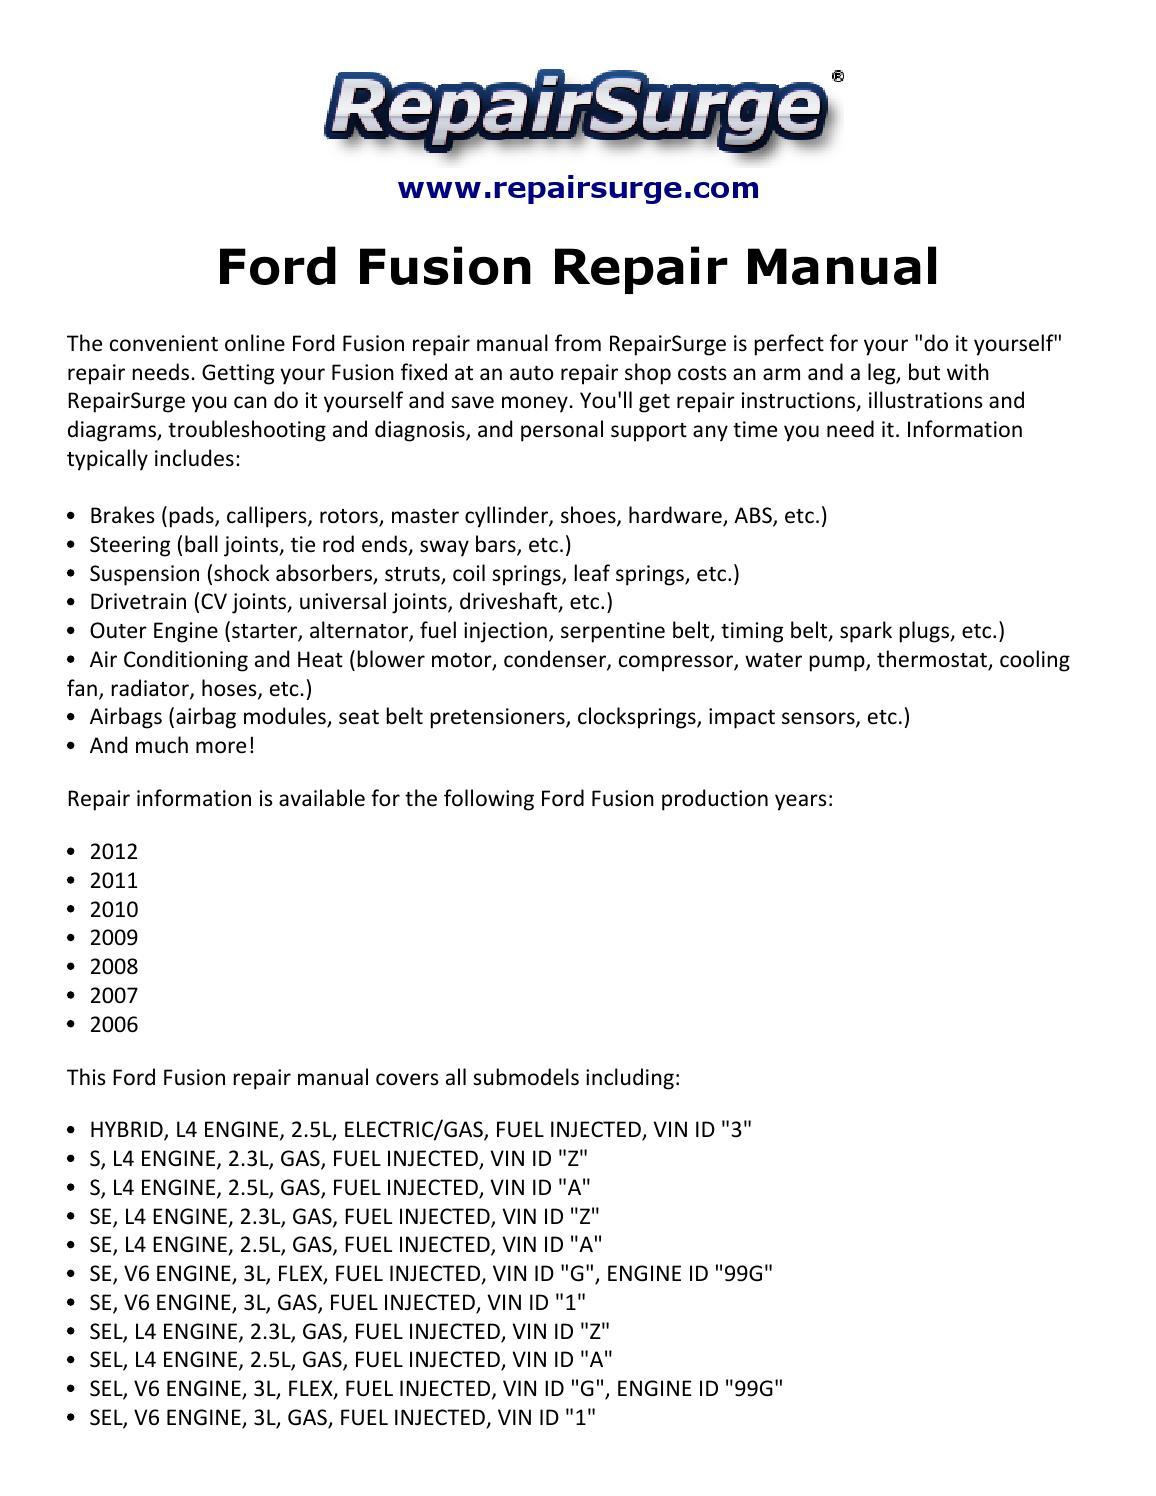 Ford Fusion Repair Manual 2006 2012 By Macy Thomas168